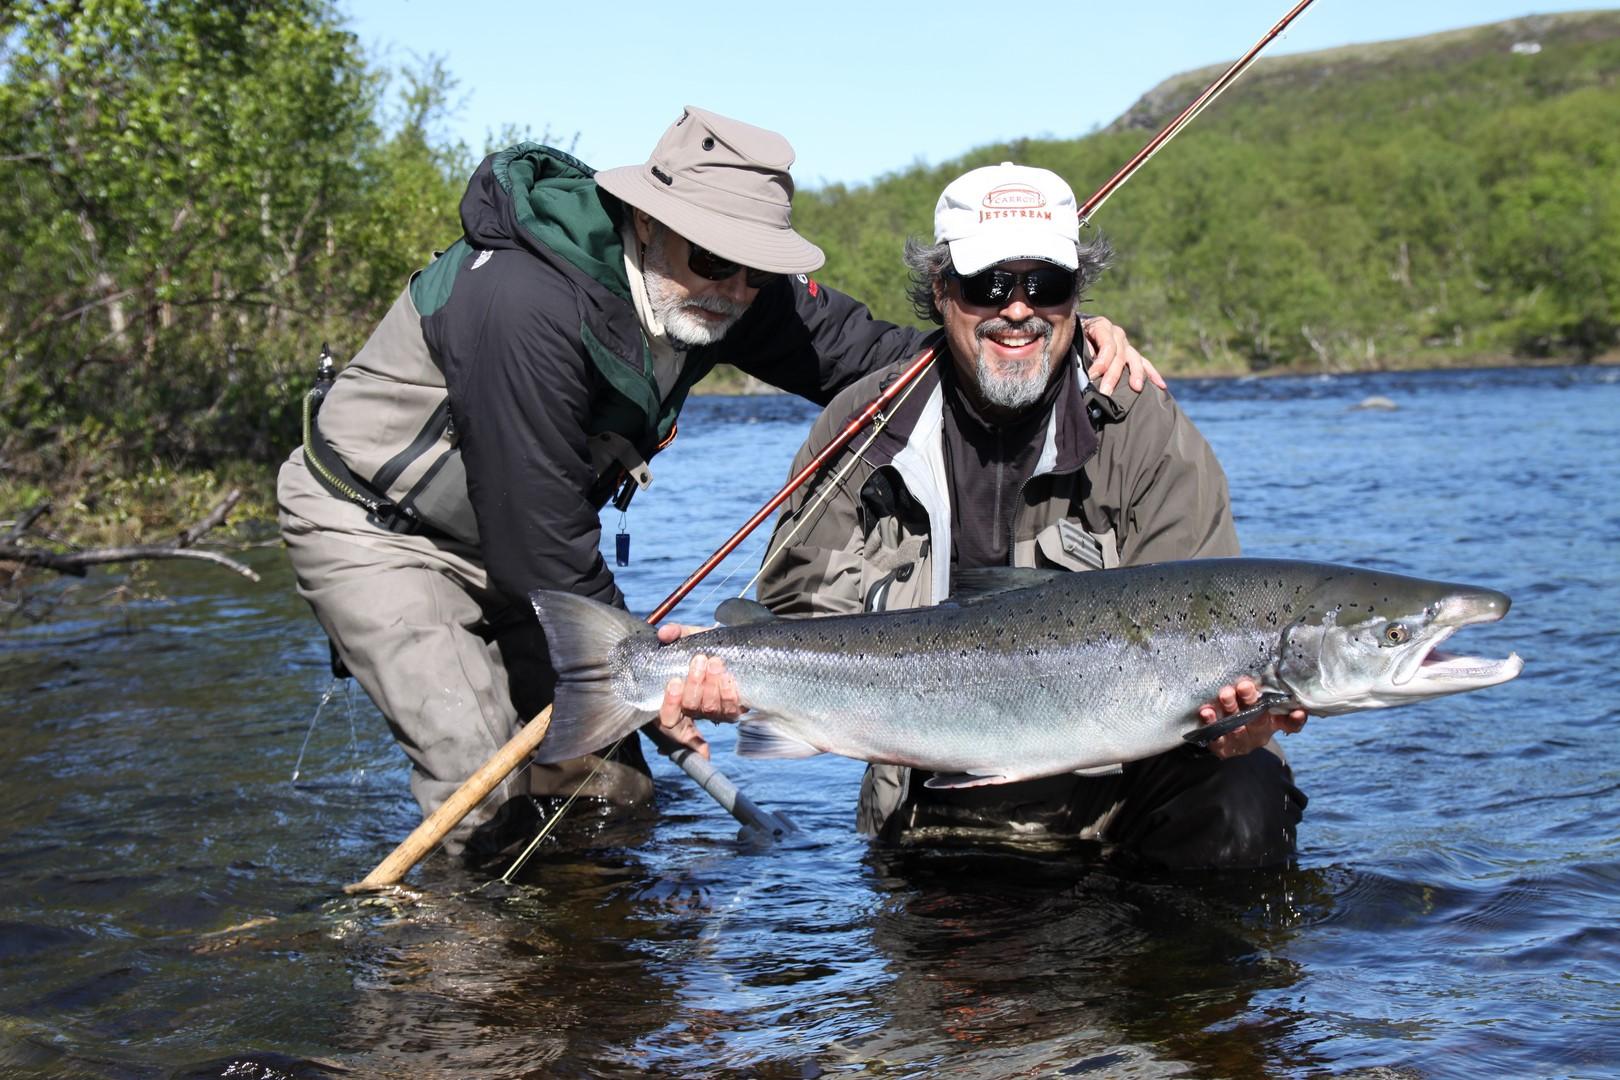 30+ lb Drozdovka River salmon